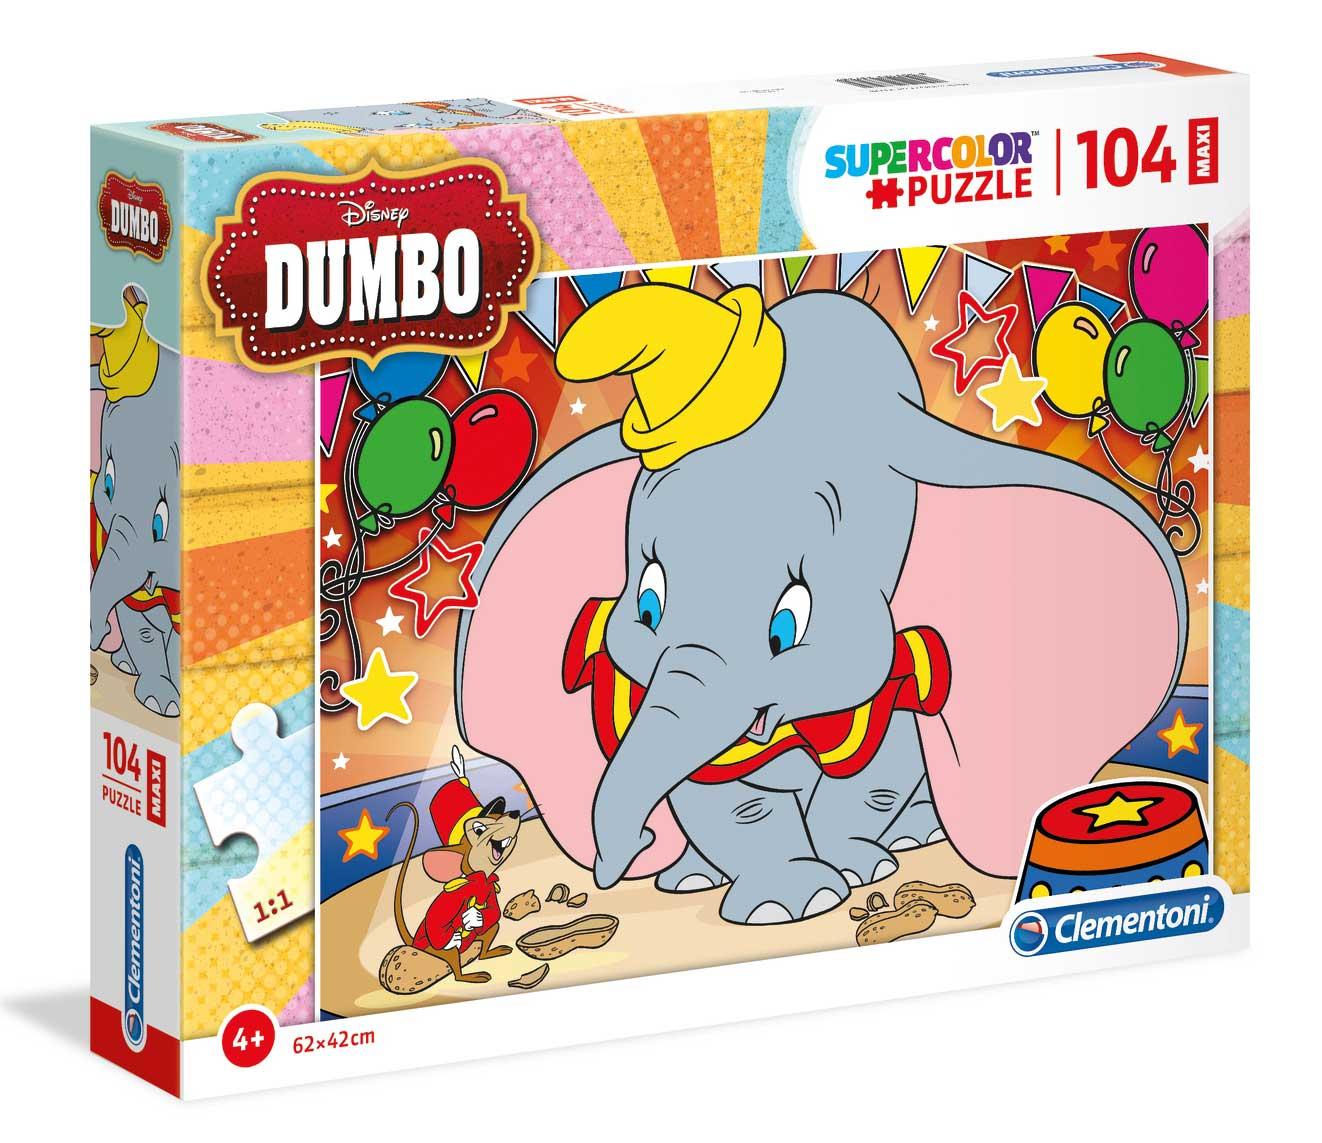 Puzzle Clementoni Dumbo Maxi 104 Piezas